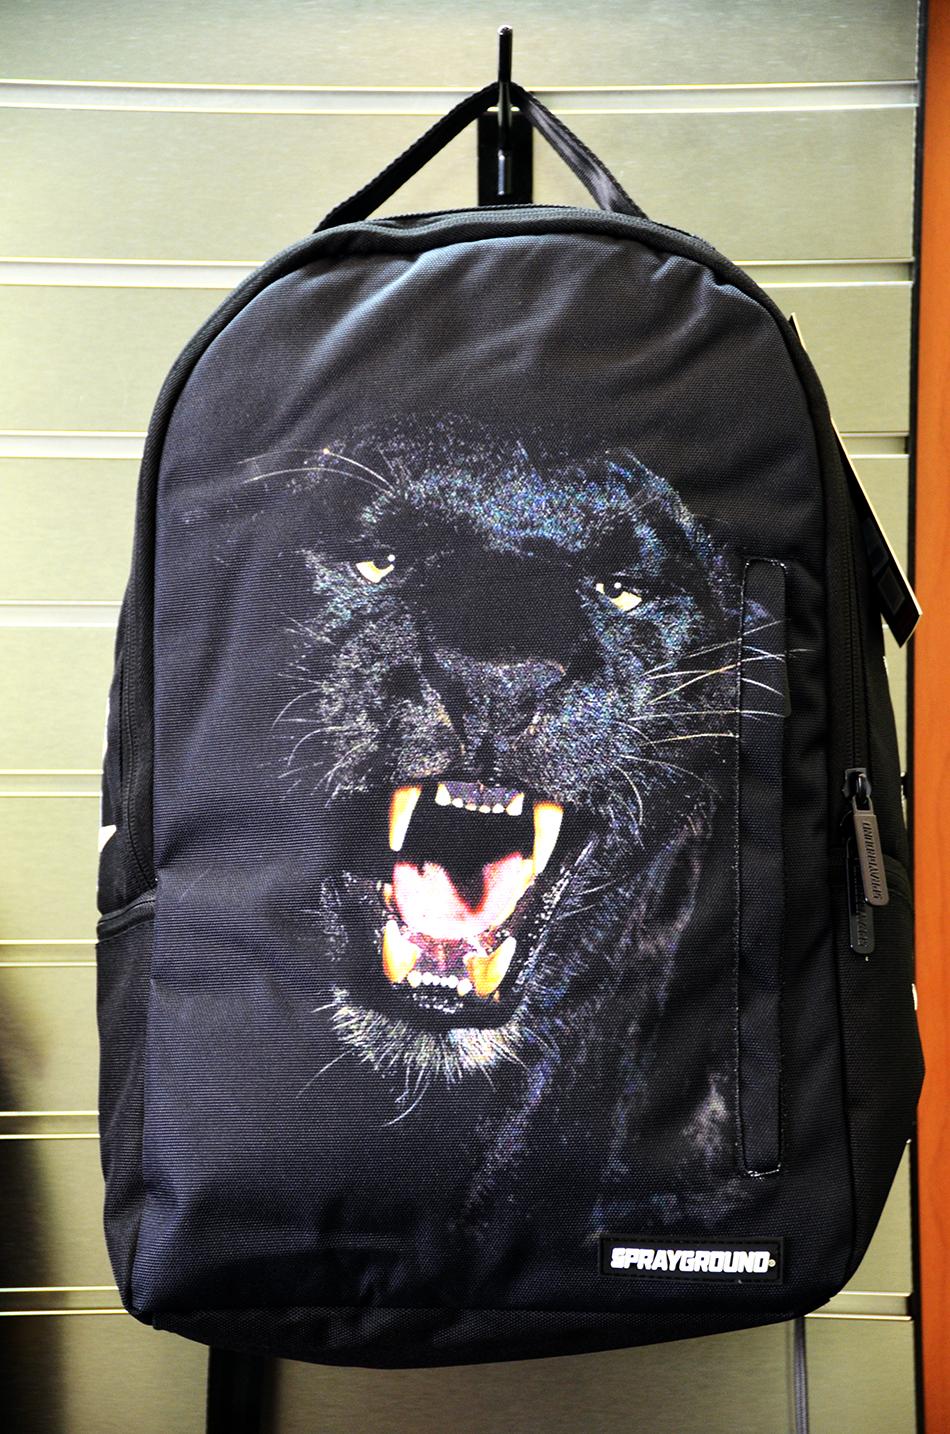 new sprayground backpacks sole boutique online sneaker